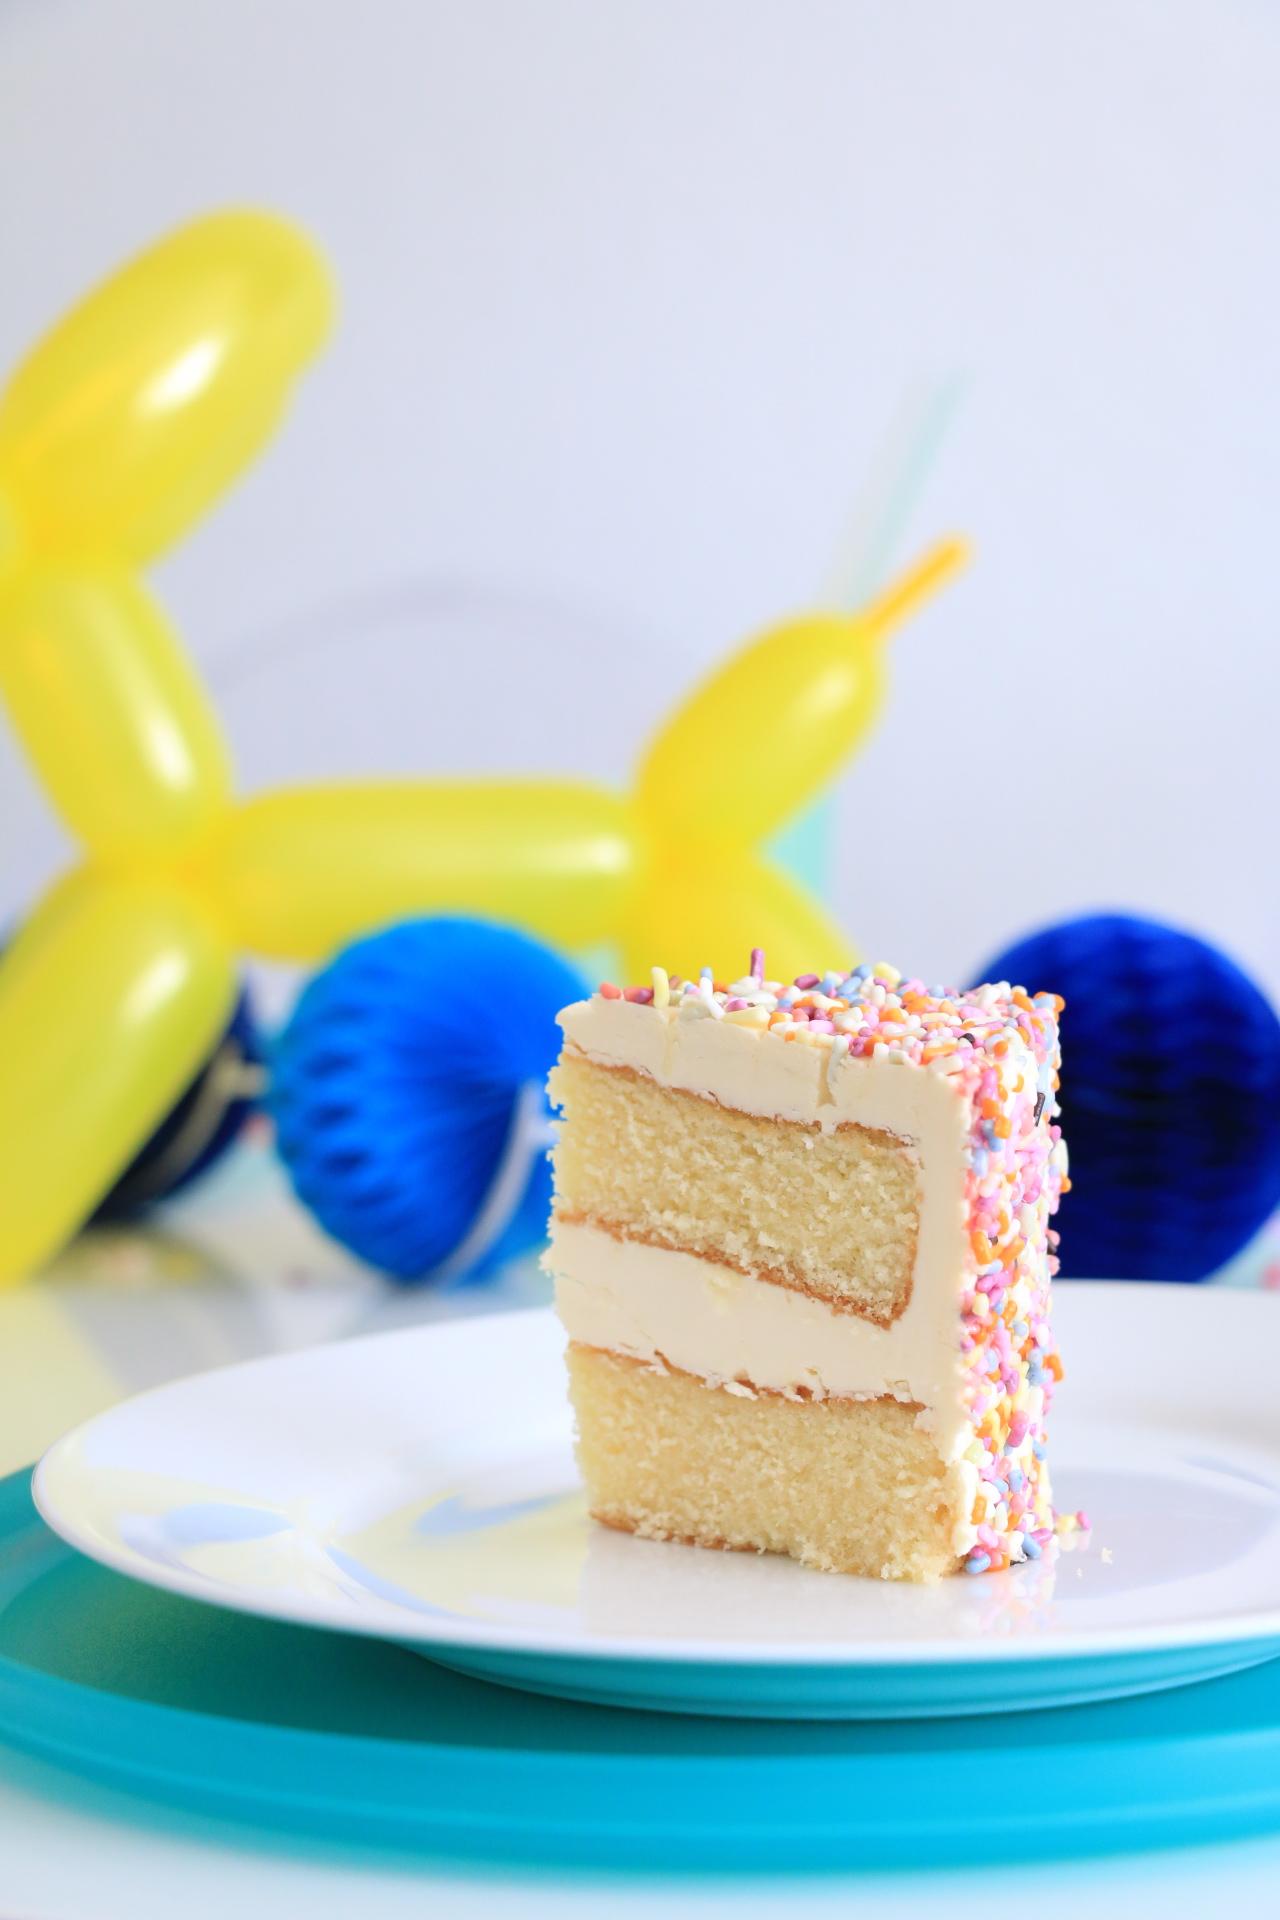 Confetti_cake_Anthony_and_stork.jpg